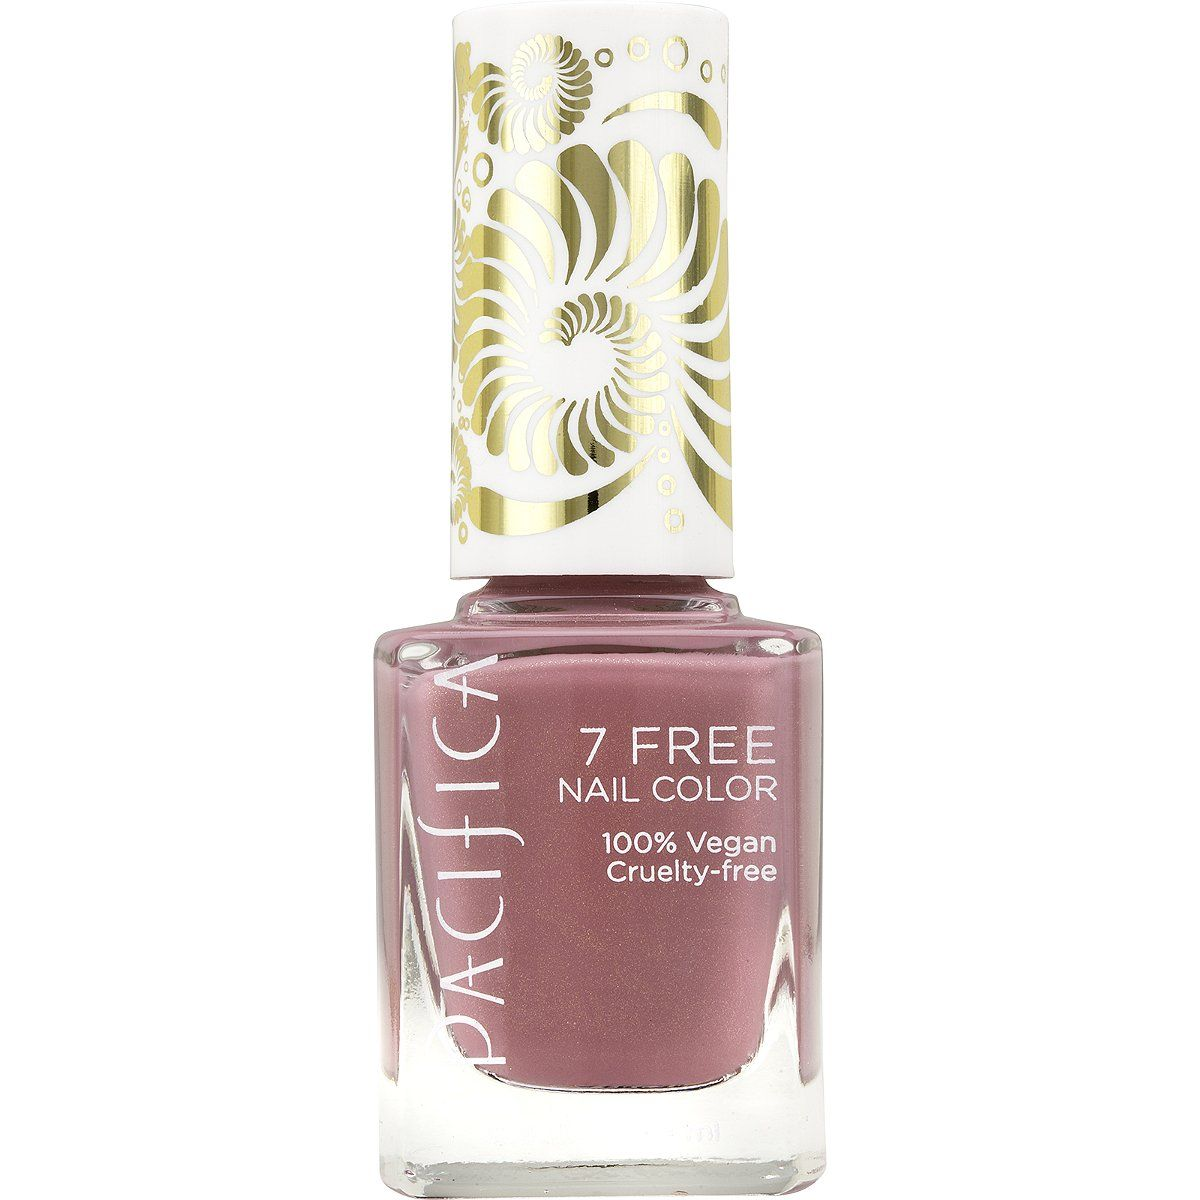 Pacifica 7 Free Nail Polish Collection | Ulta Beauty